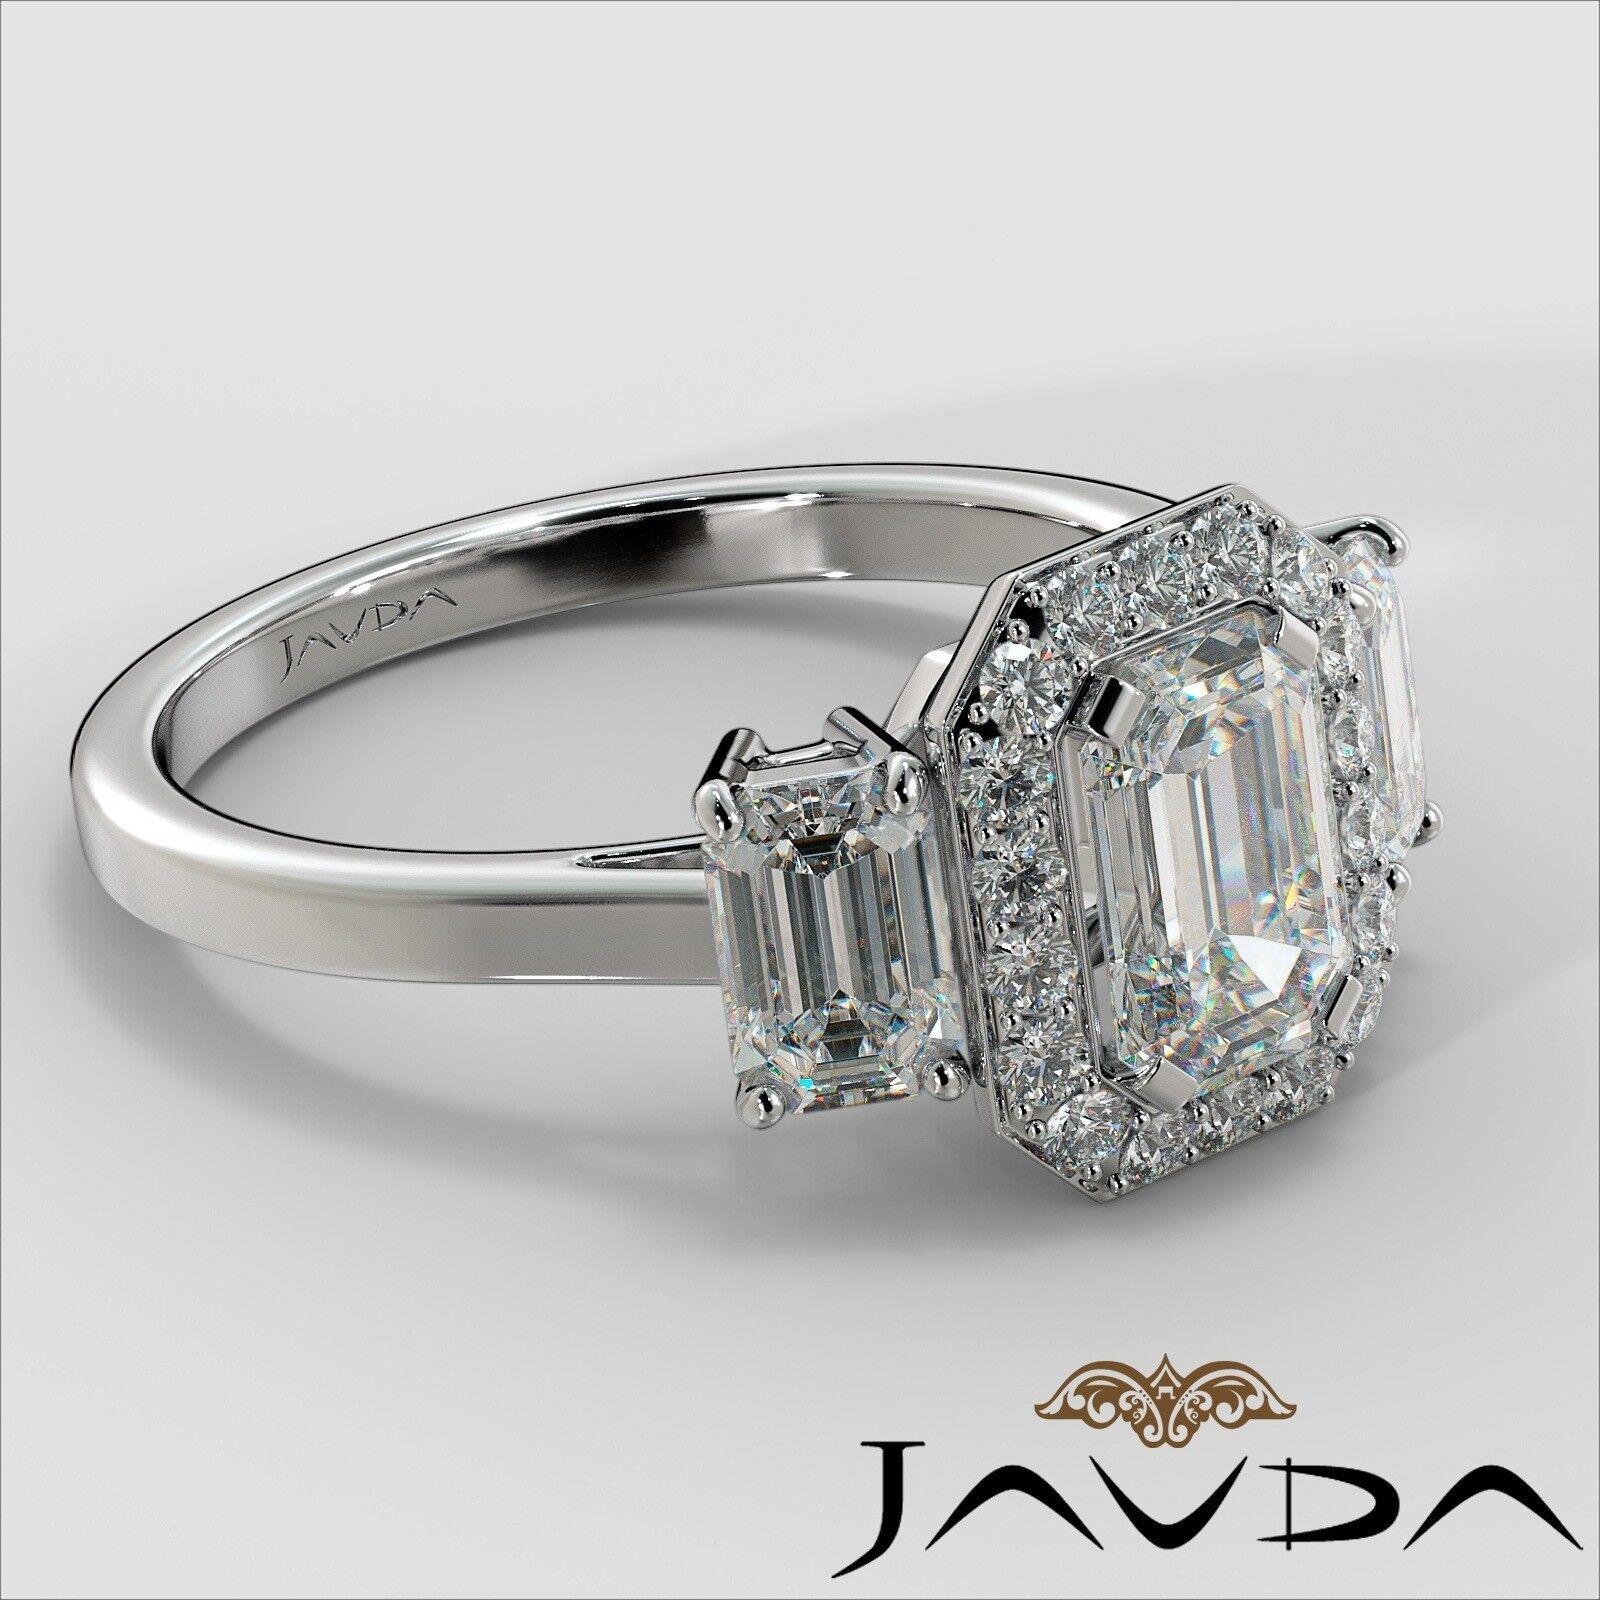 1.55ctw 3 Stone Halo Pave Emerald Diamond Engagement Ring GIA F-SI2 White Gold 2